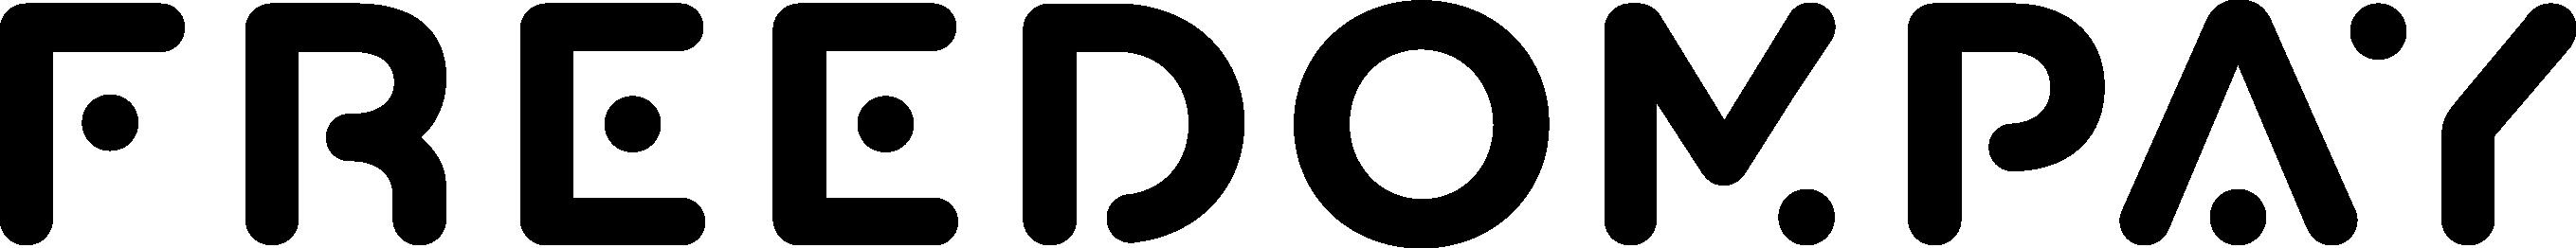 FreedomPay logo